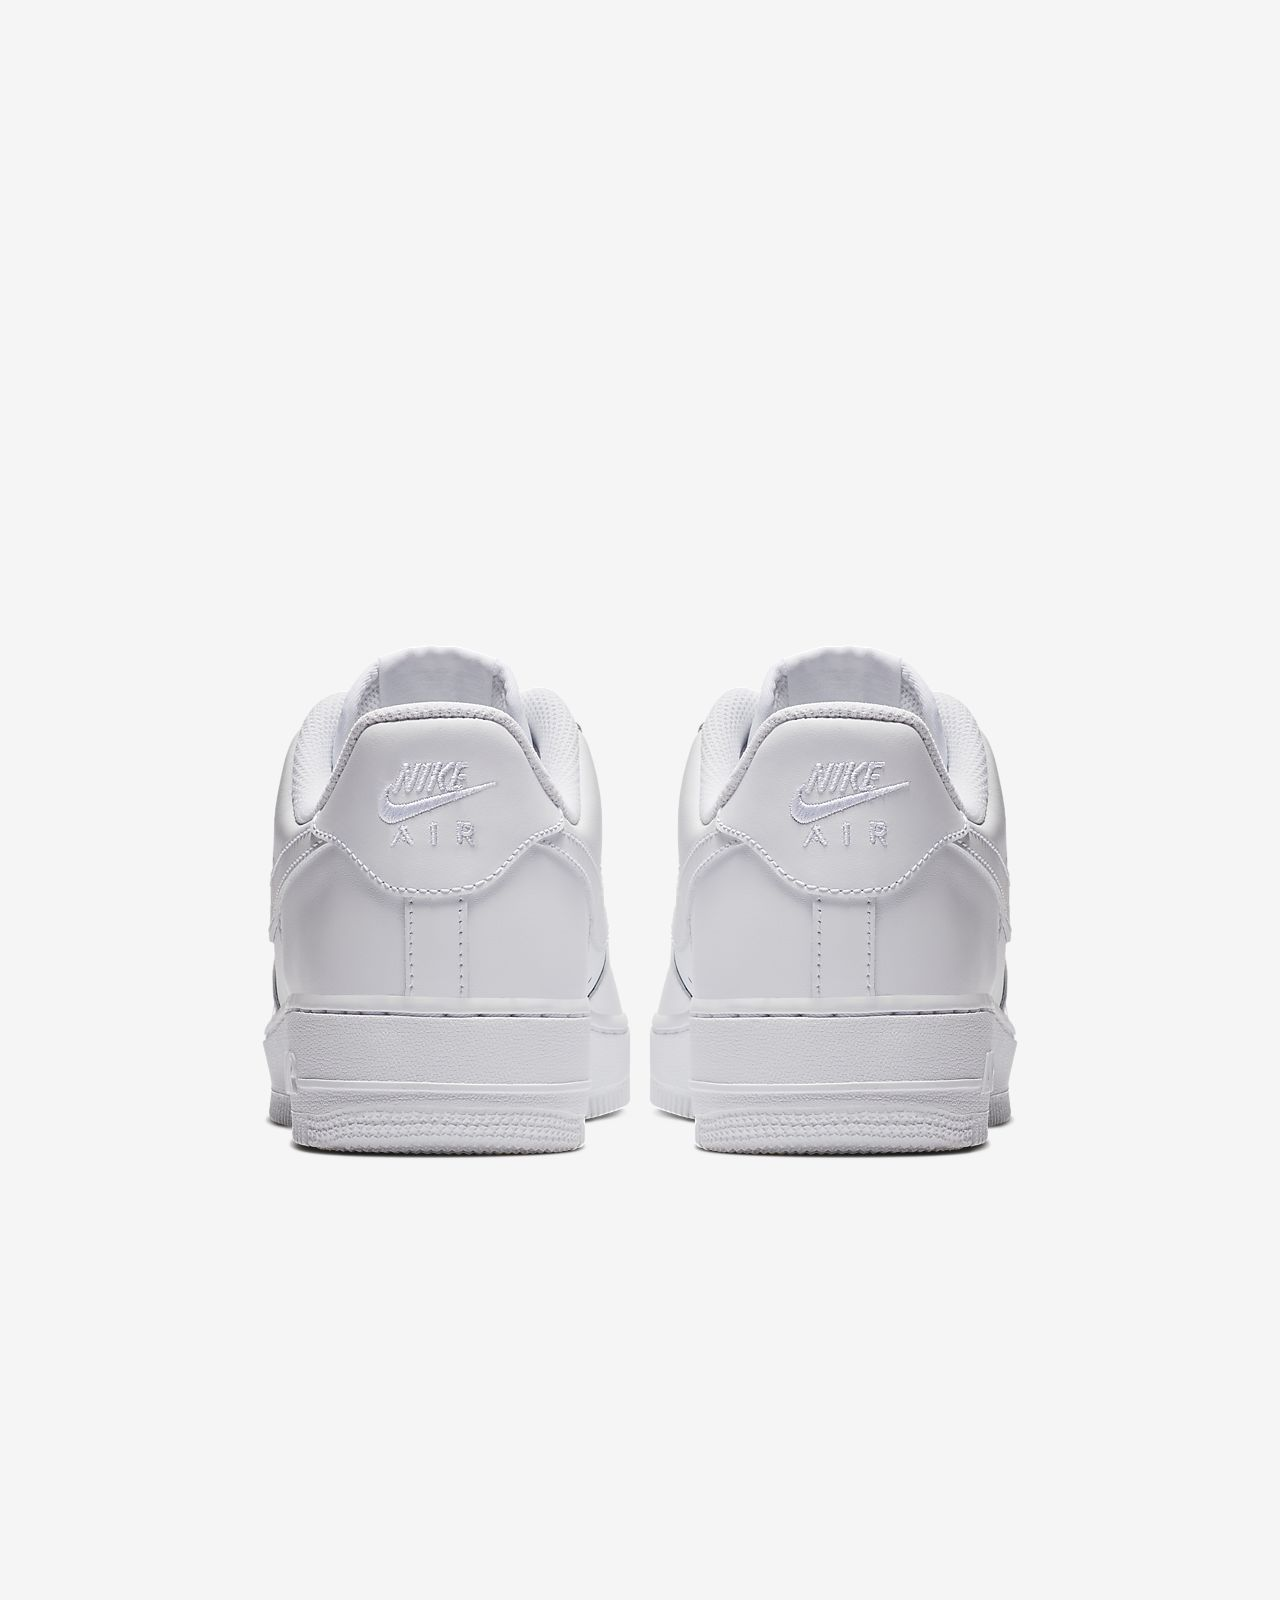 c0a4456eaf019 Nike Air Force 1  07 Women s Shoe. Nike.com GB